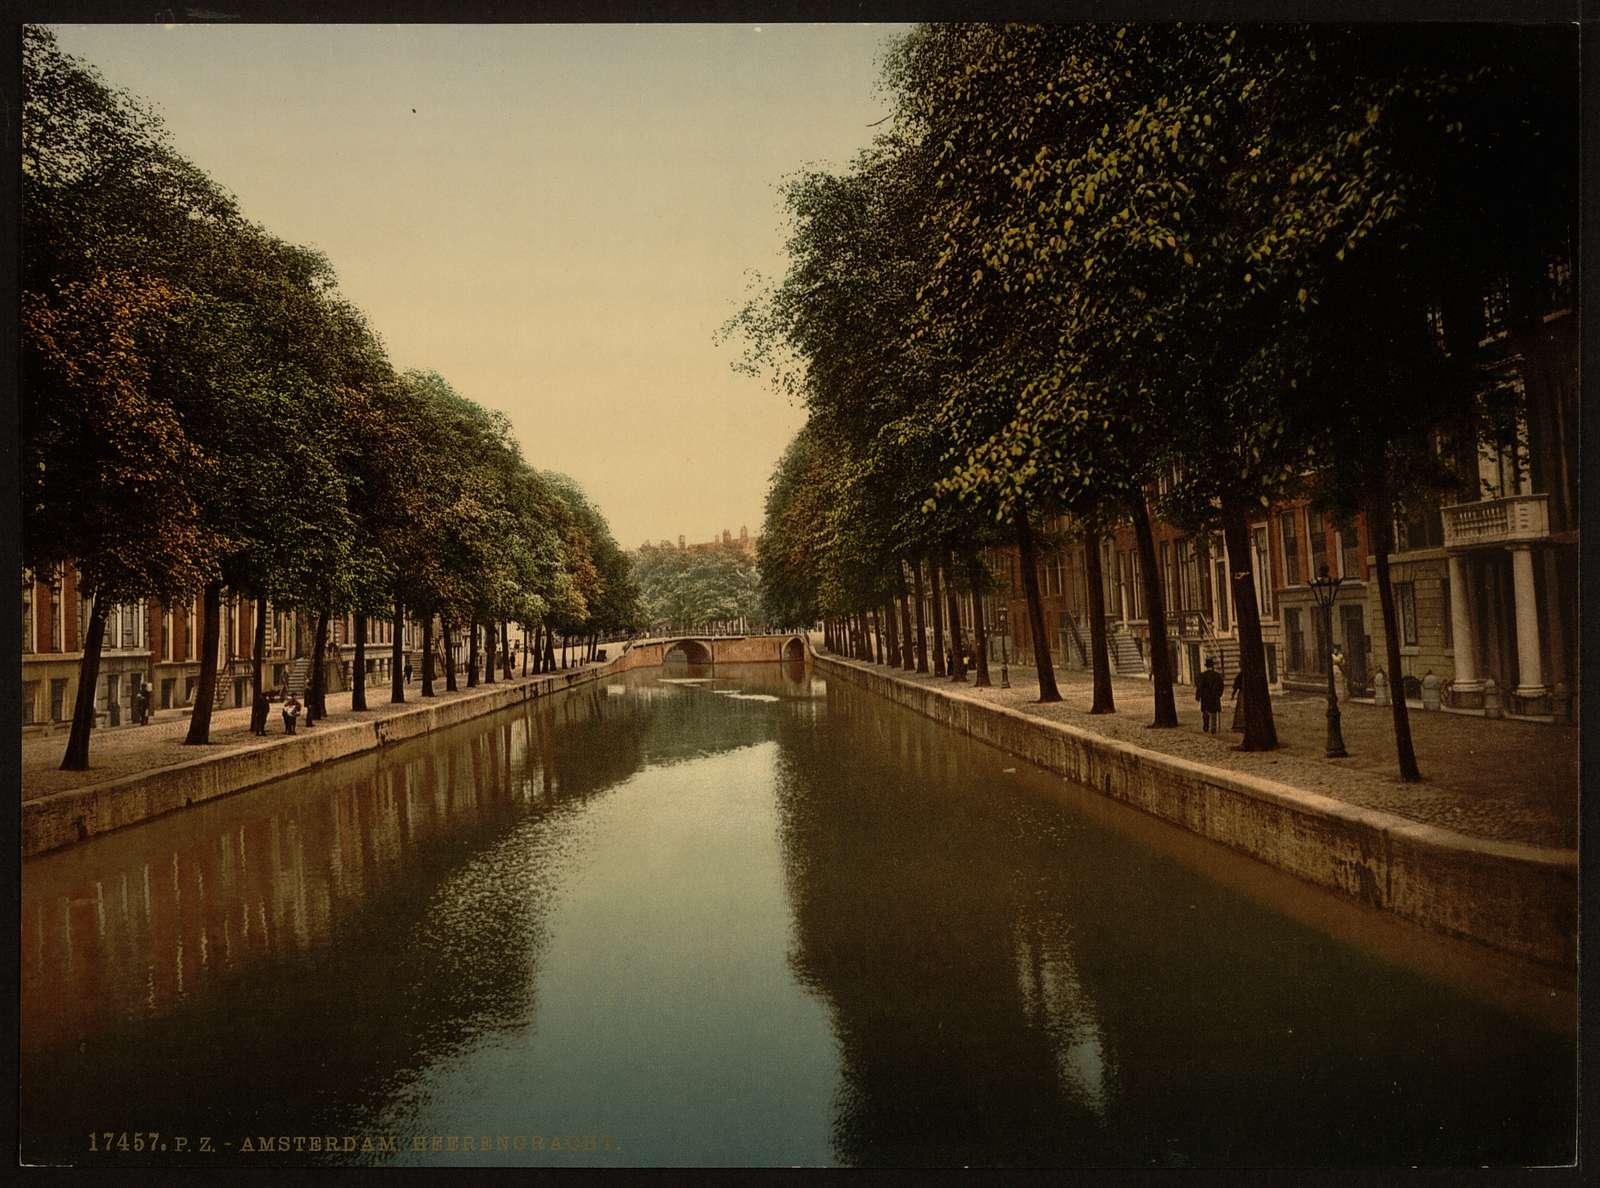 [The Heerengracht (main canal), Amsterdam, Holland]